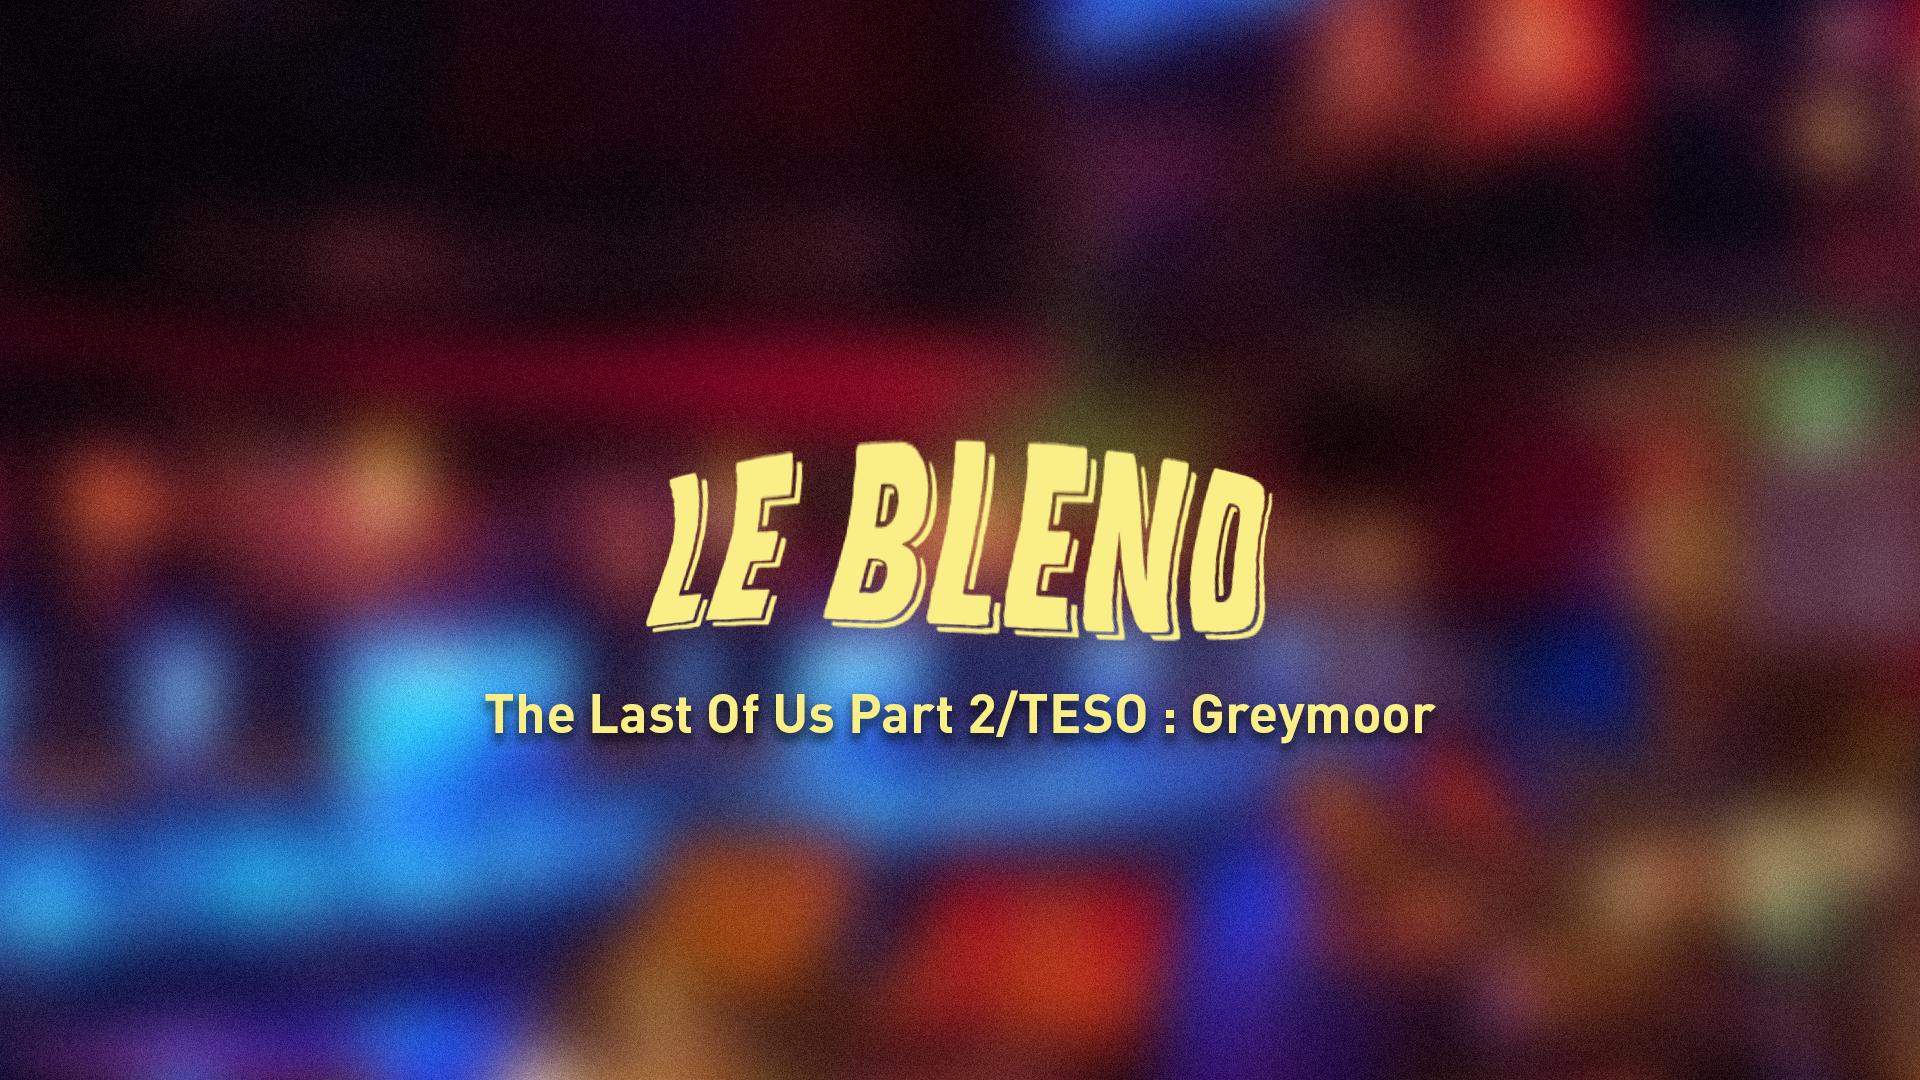 Blend #6 The Last of Us 2/TESO: Greymoor ET Röki/Draugen